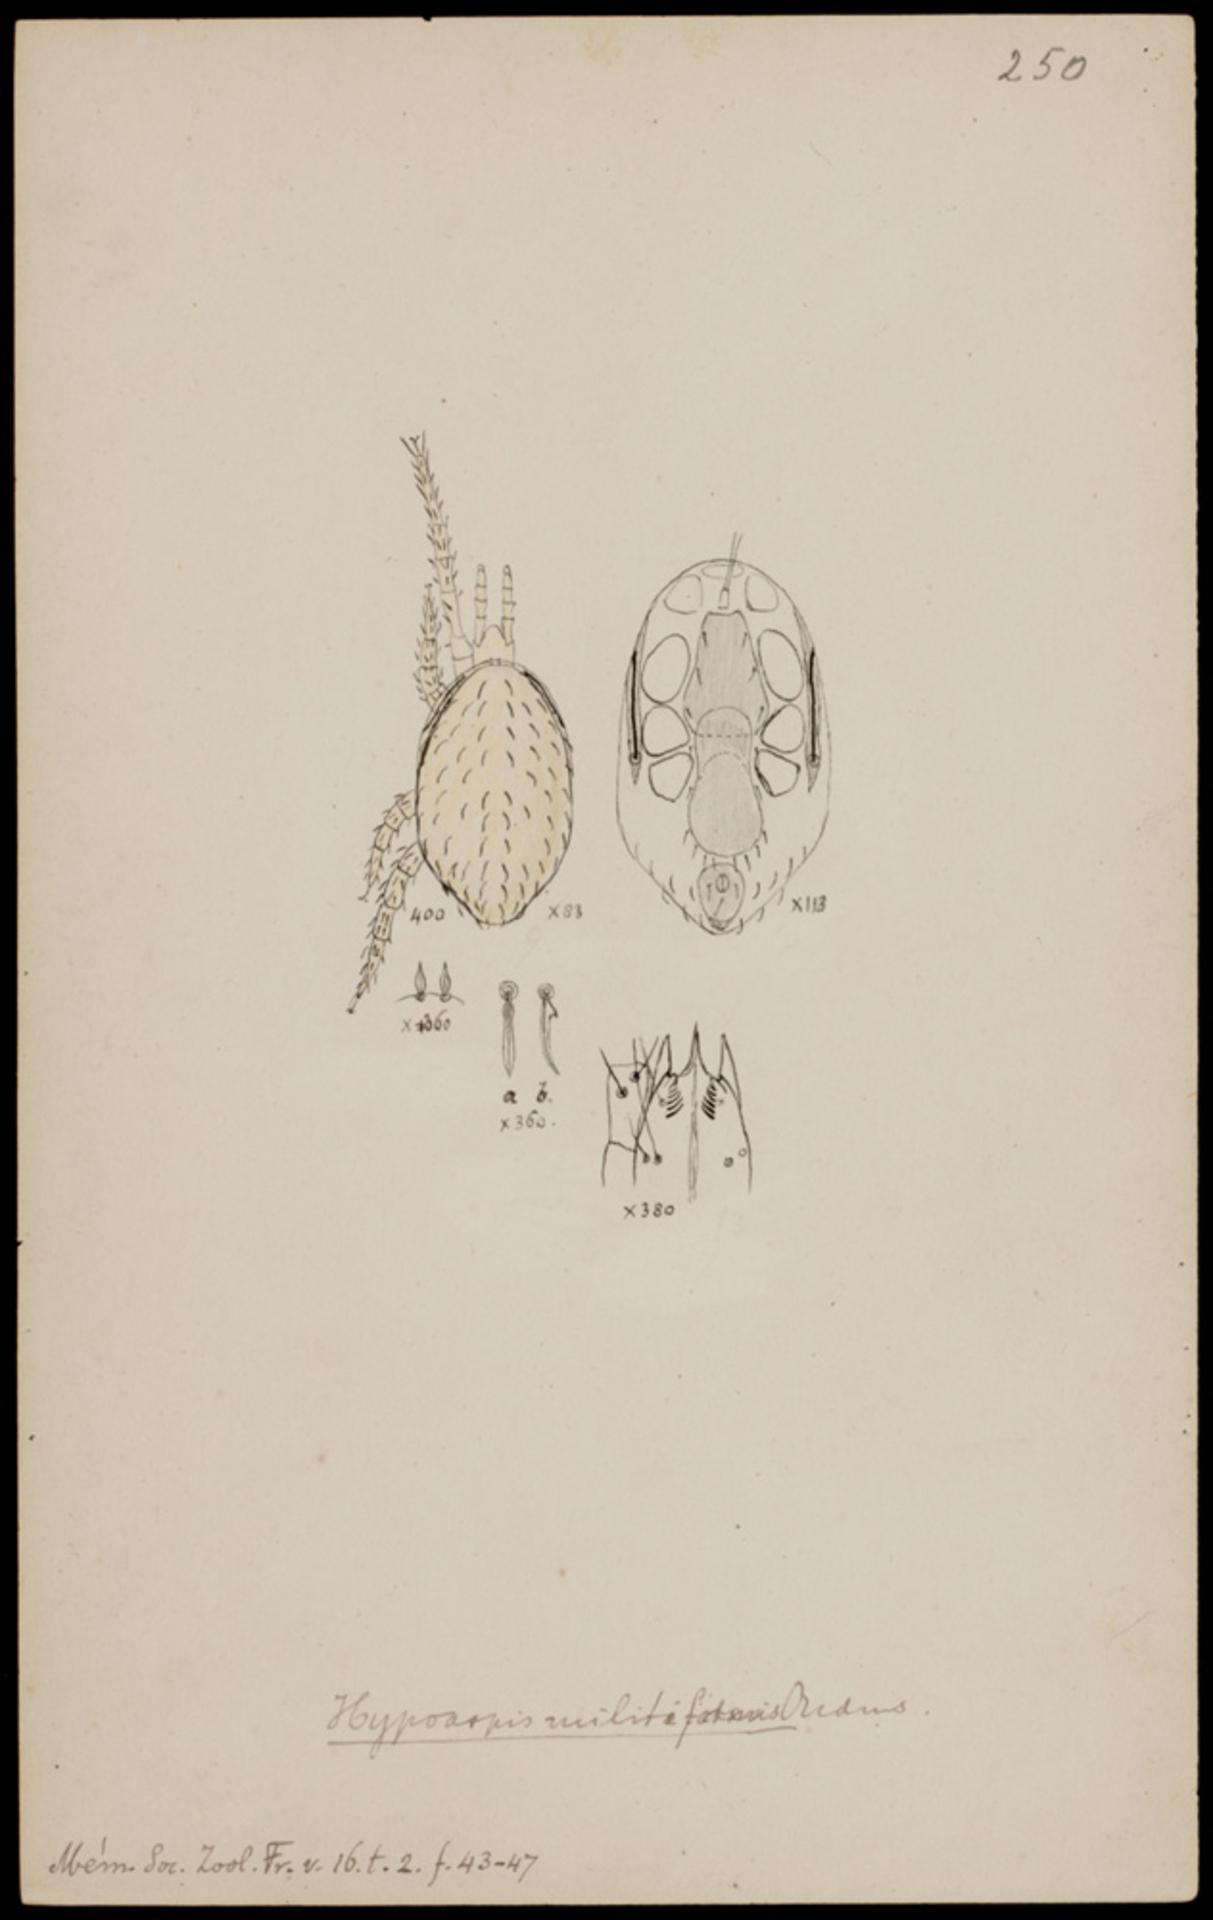 RMNH.ART.1081   Hypoaspis militiformis (Oudemans)